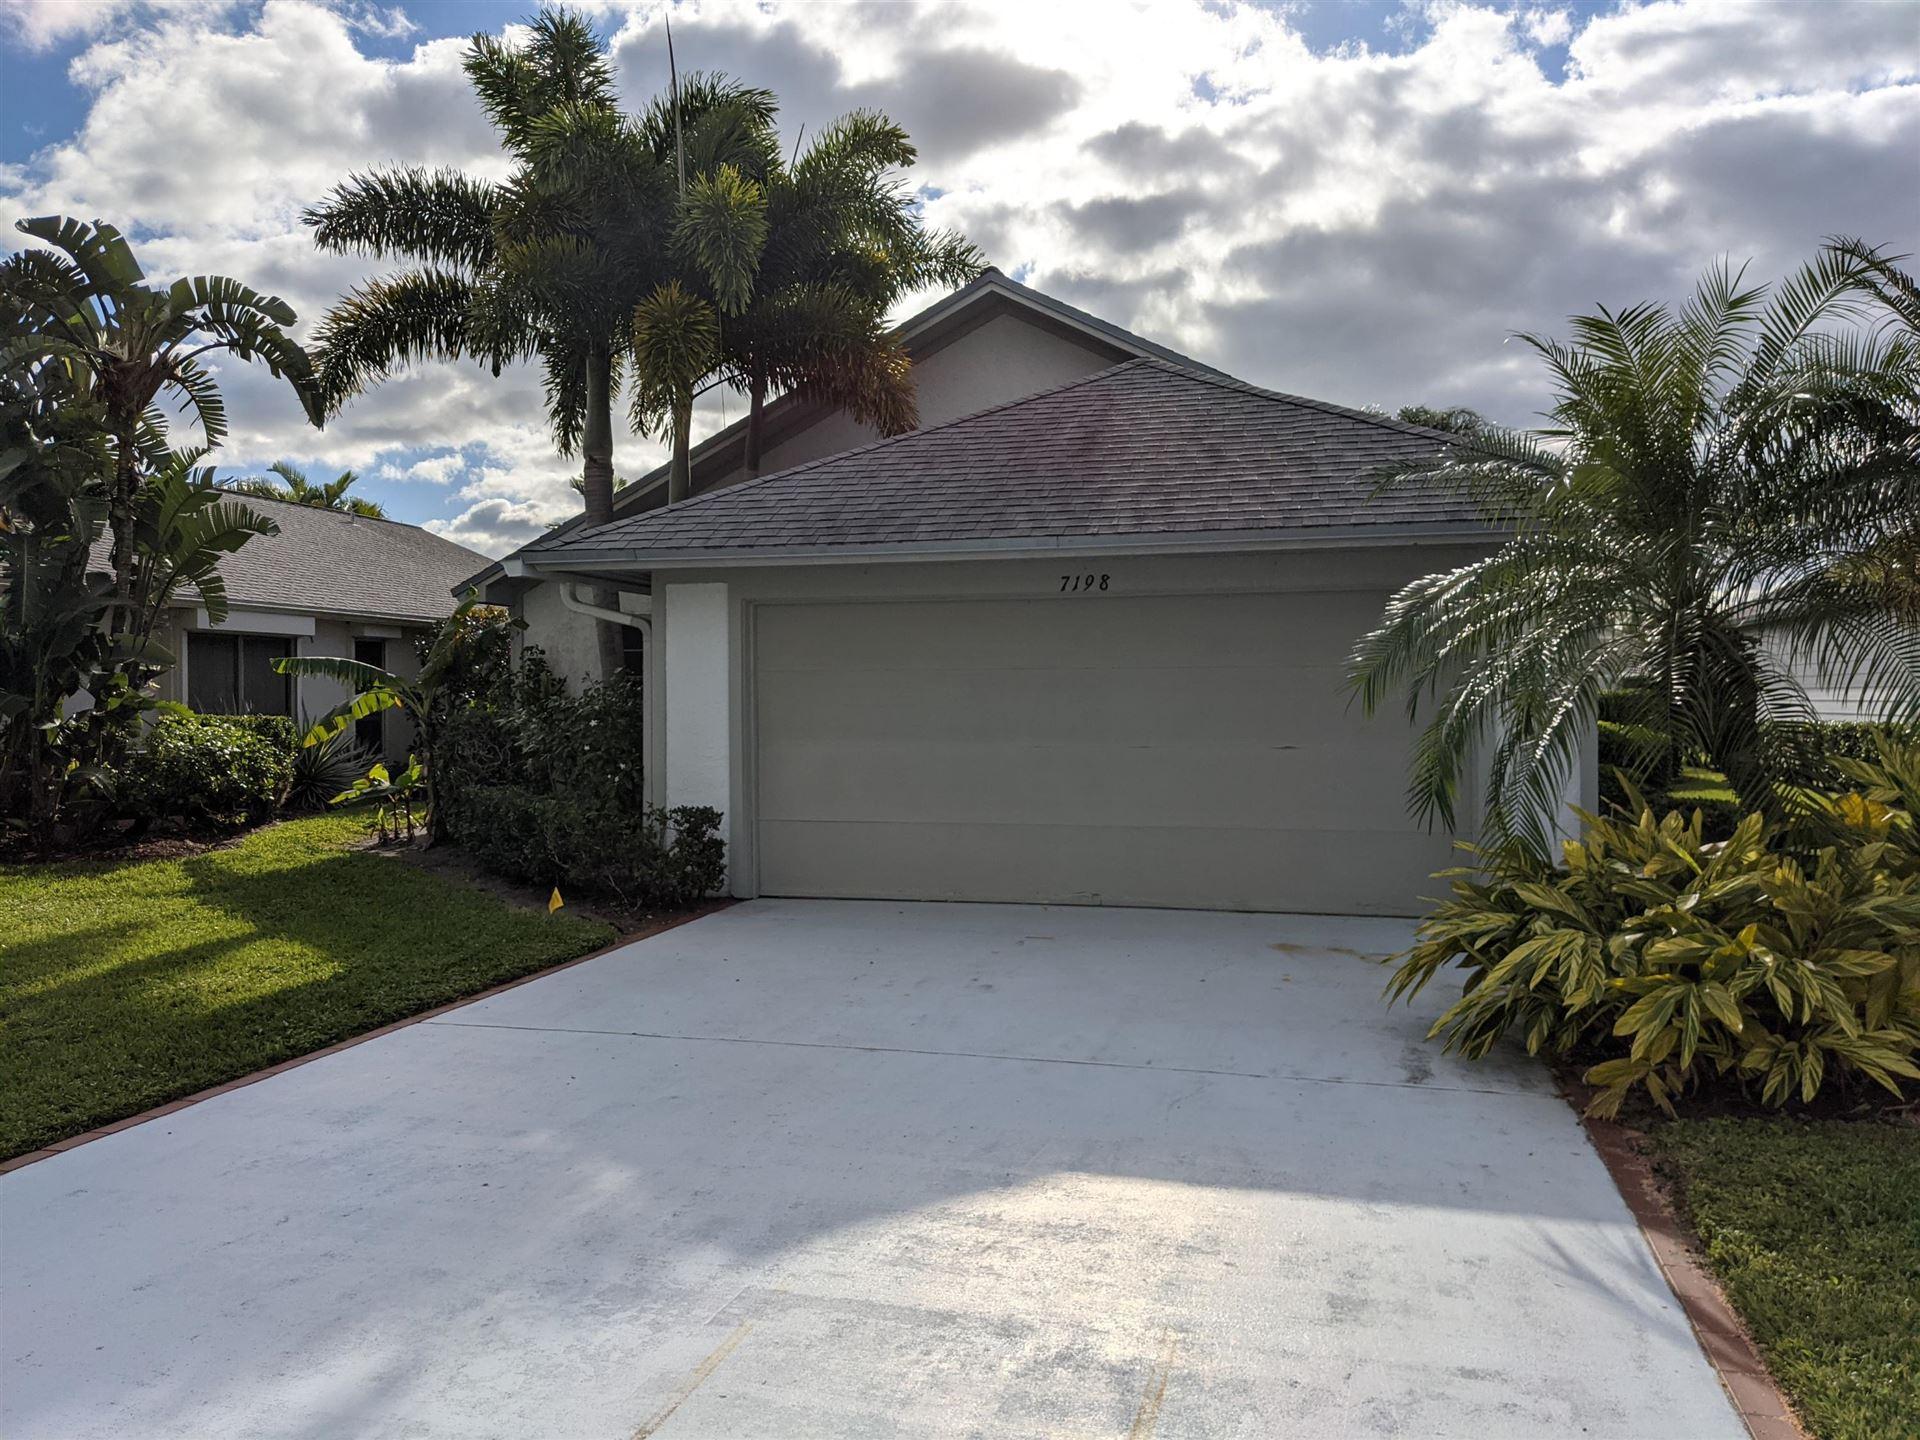 Photo of 7198 SE Quincy Terrace, Hobe Sound, FL 33455 (MLS # RX-10675623)